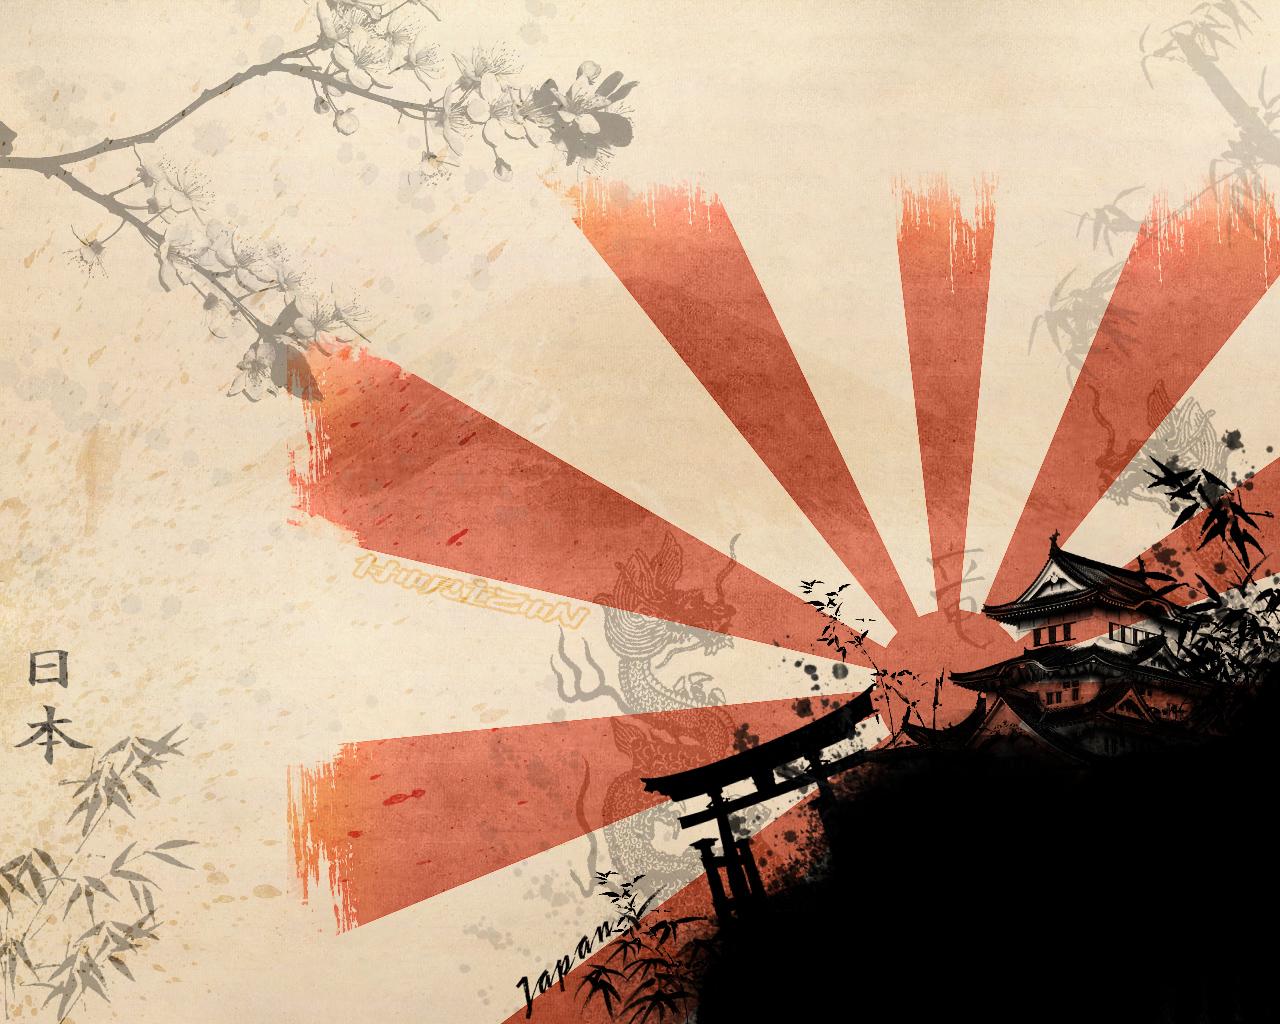 SamuraiJapaneseWallArtandCherryBlossomArtWallpaper japanjpg 1280x1024